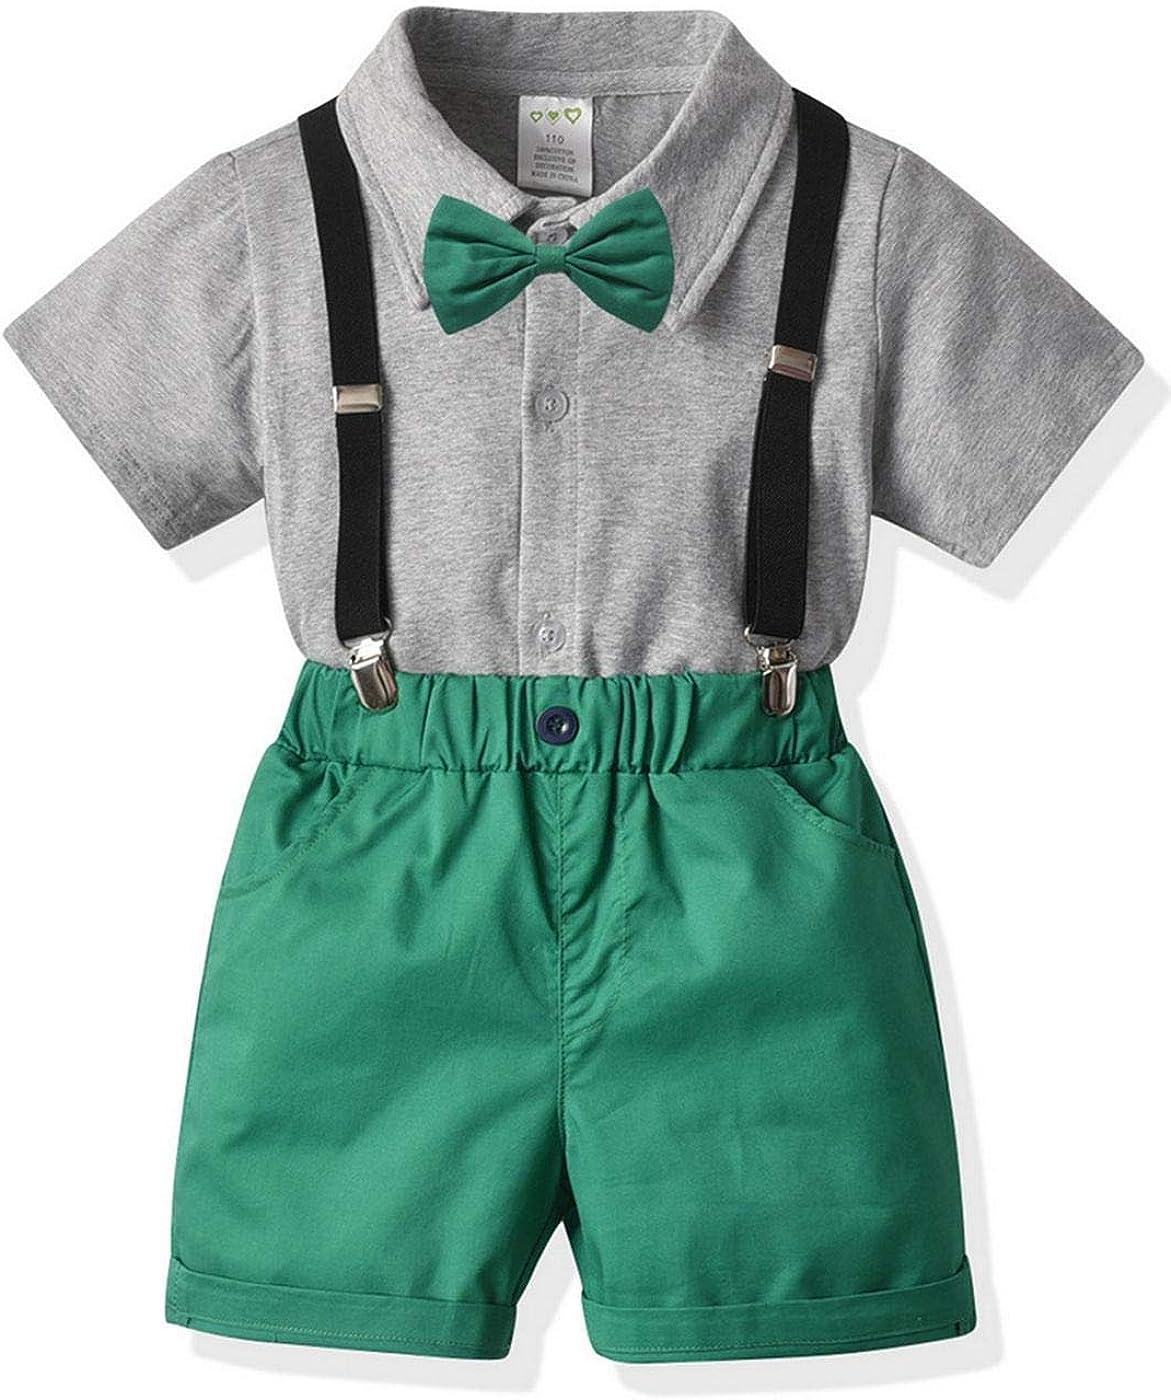 Children,Kids Boys Baby,Suspenders+bow tie 6months,2T,3T,4T-5T,blush,Ring bearer,wedding